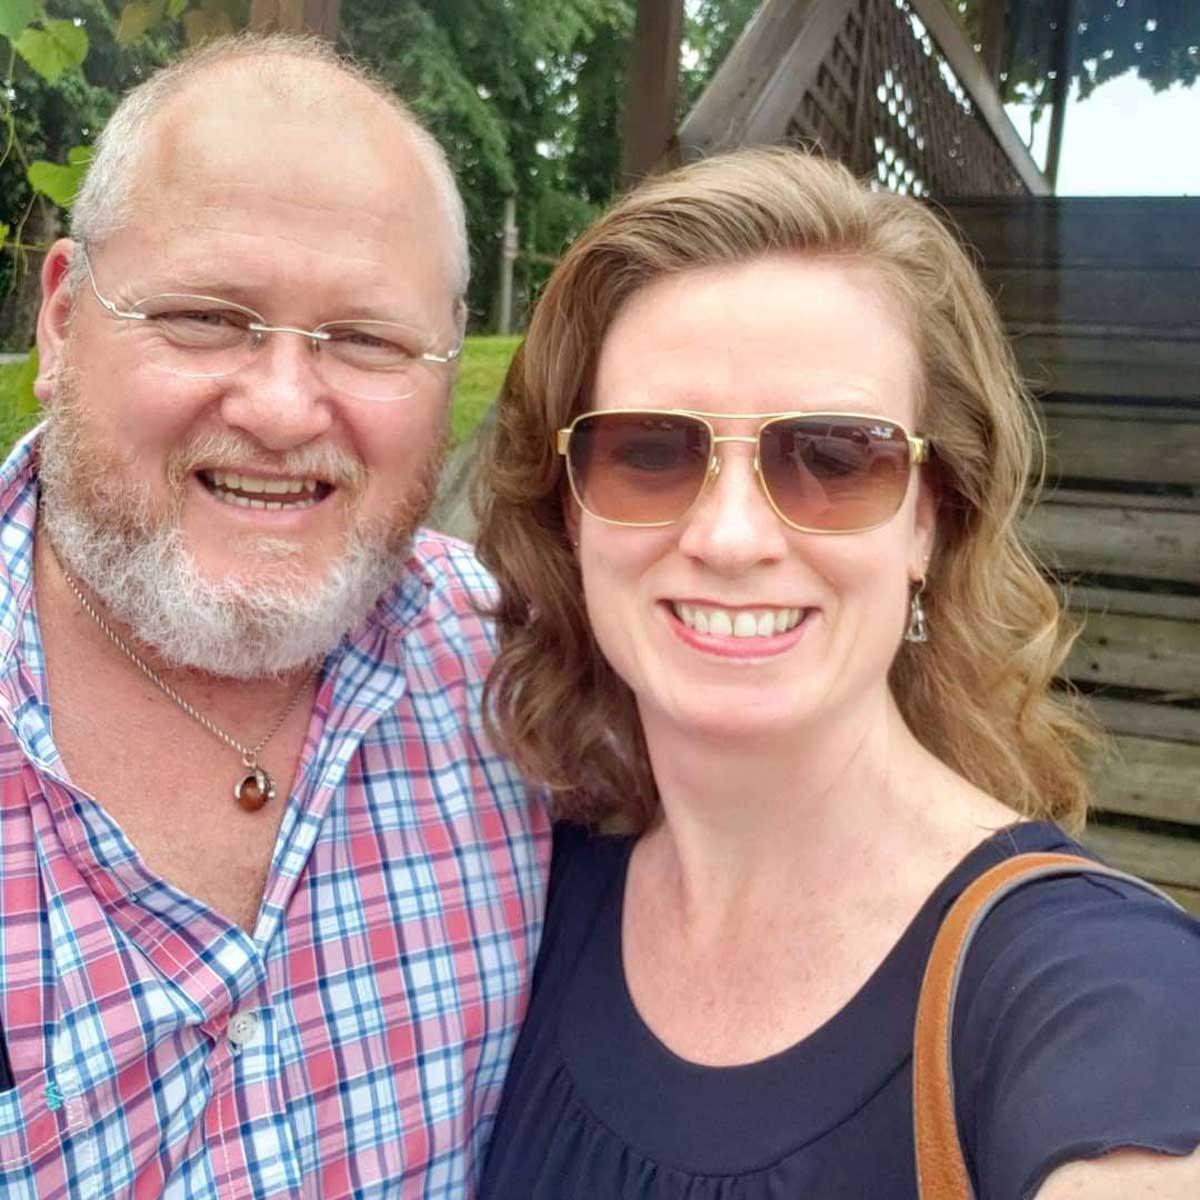 Debbie and David day drankin'